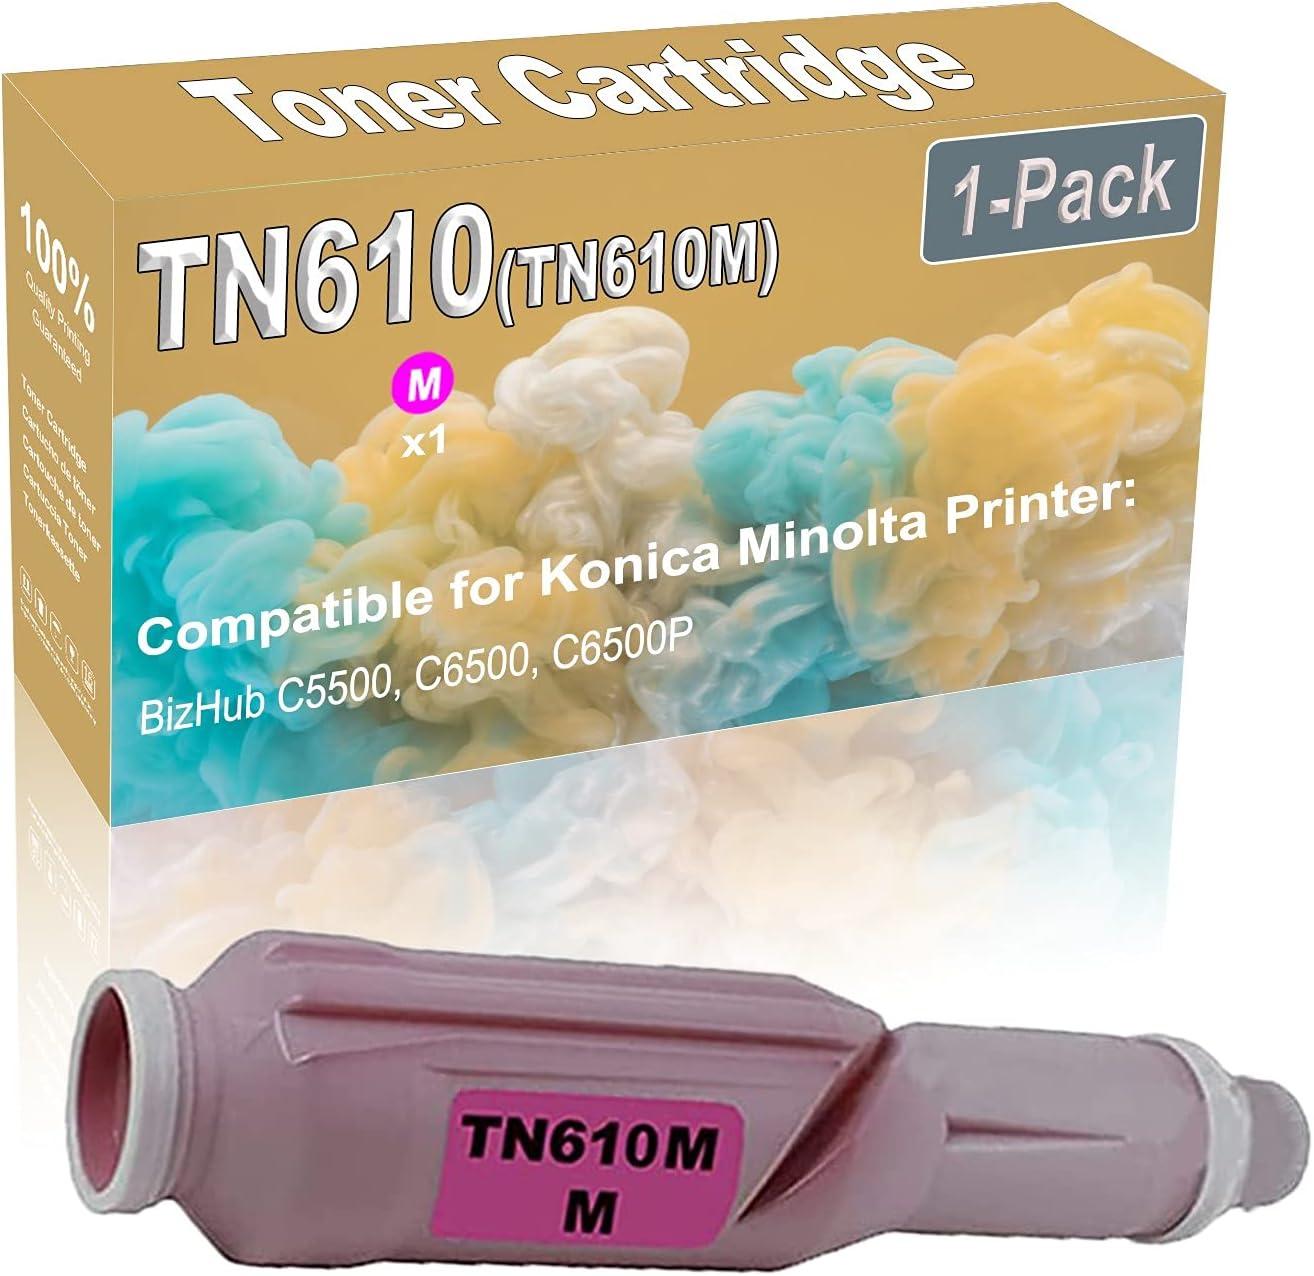 1-Pack (Magenta) Compatible BizHub C5500 C6500 Laser Printer Toner Cartridge (High Capacity) Replacement for Konica Minolta TN610 (TN610M) Printer Toner Cartridge